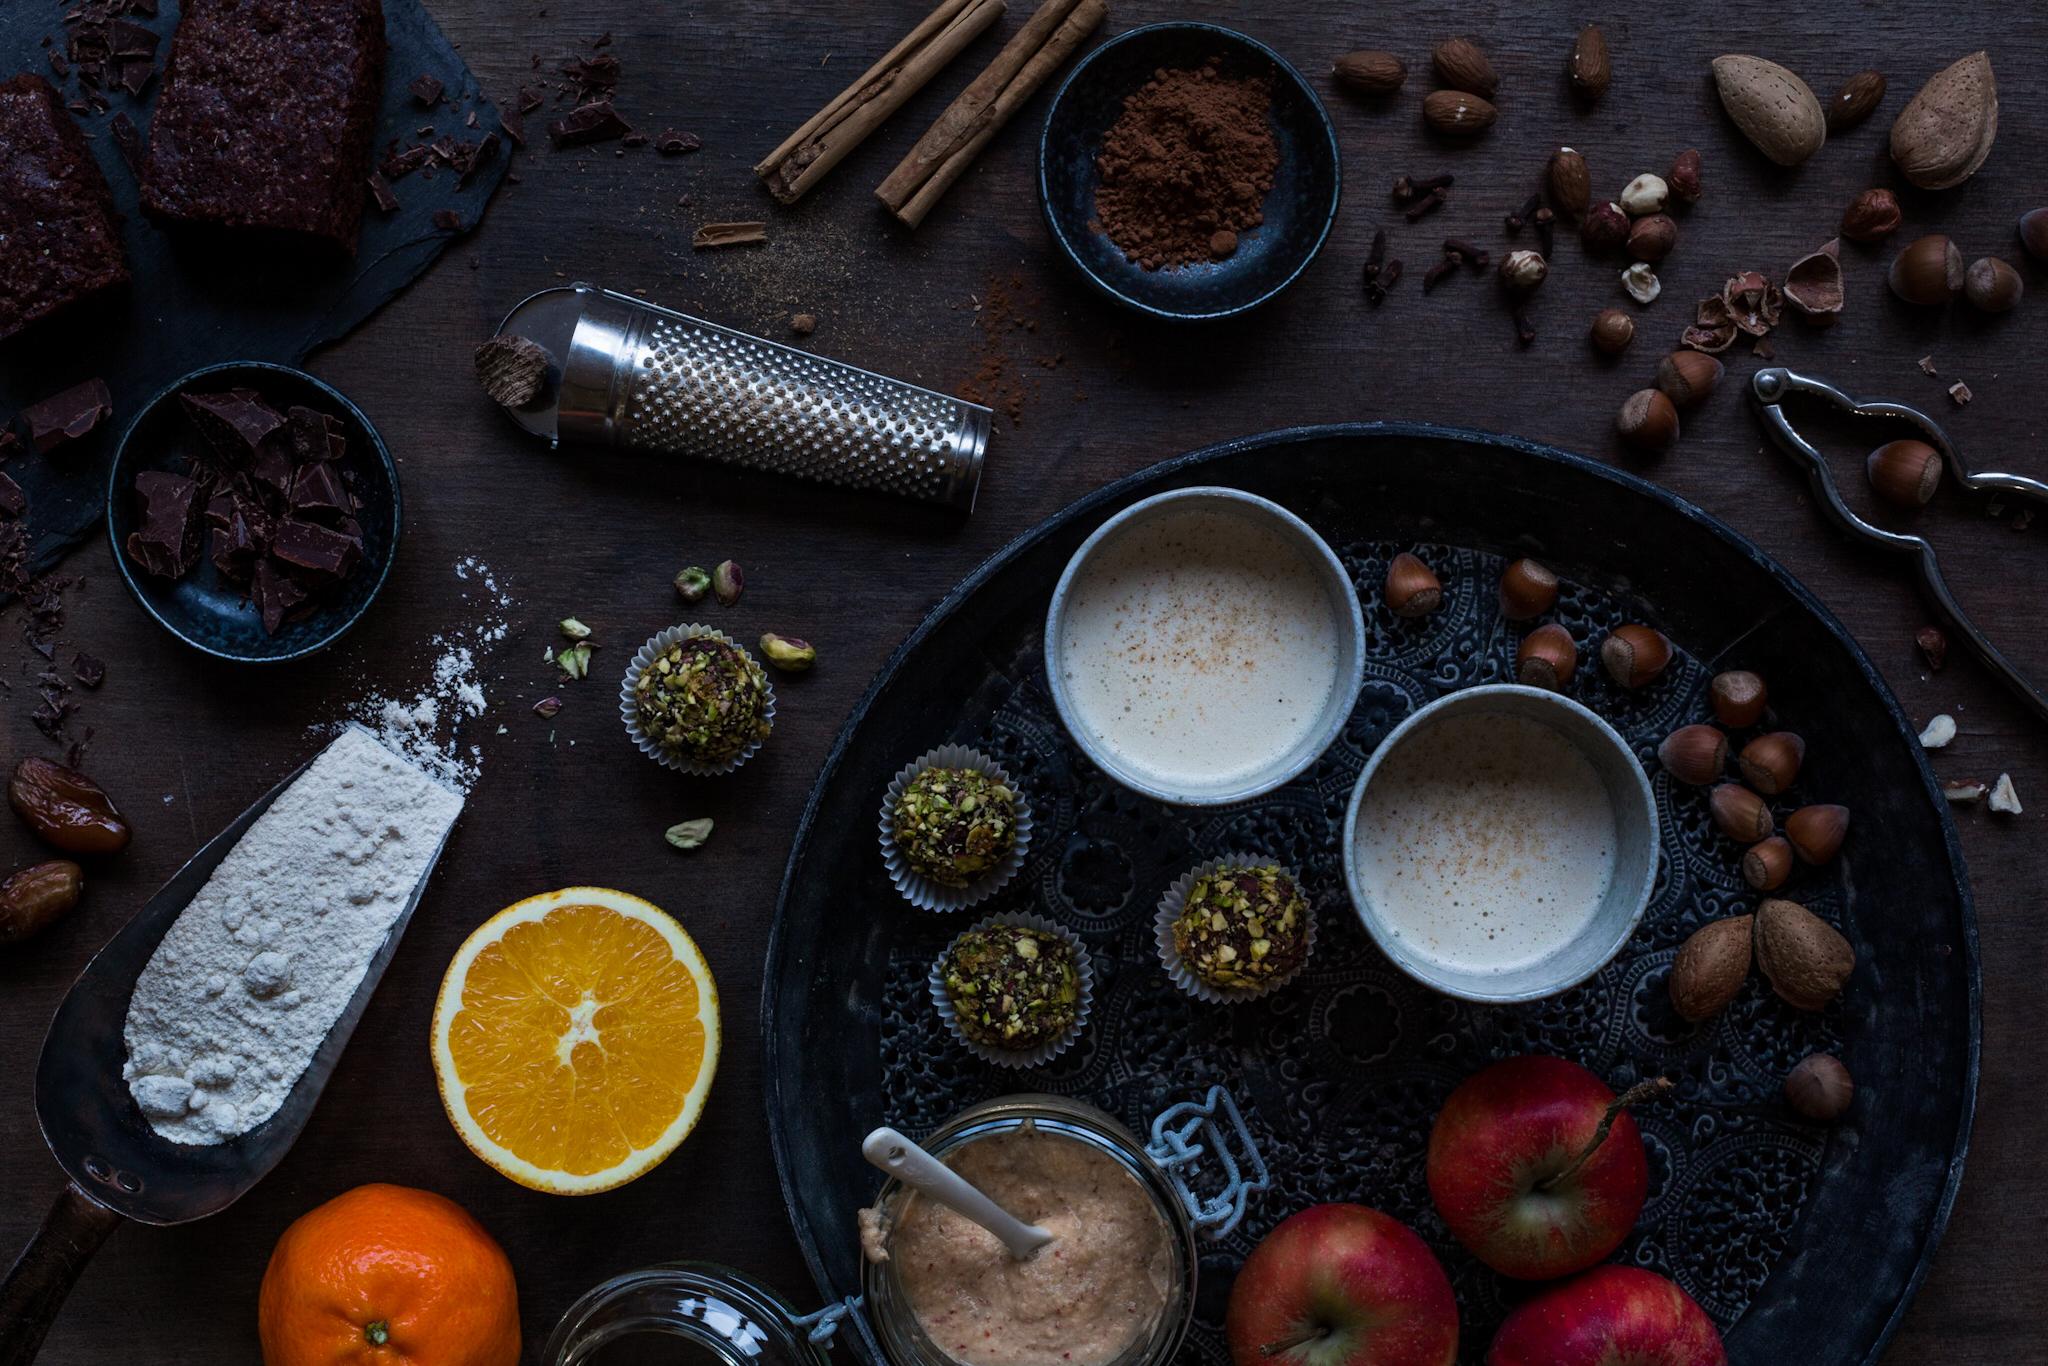 Die grüne Stadtküche Kochkurs Sweet Vegan Dreams Moodbild